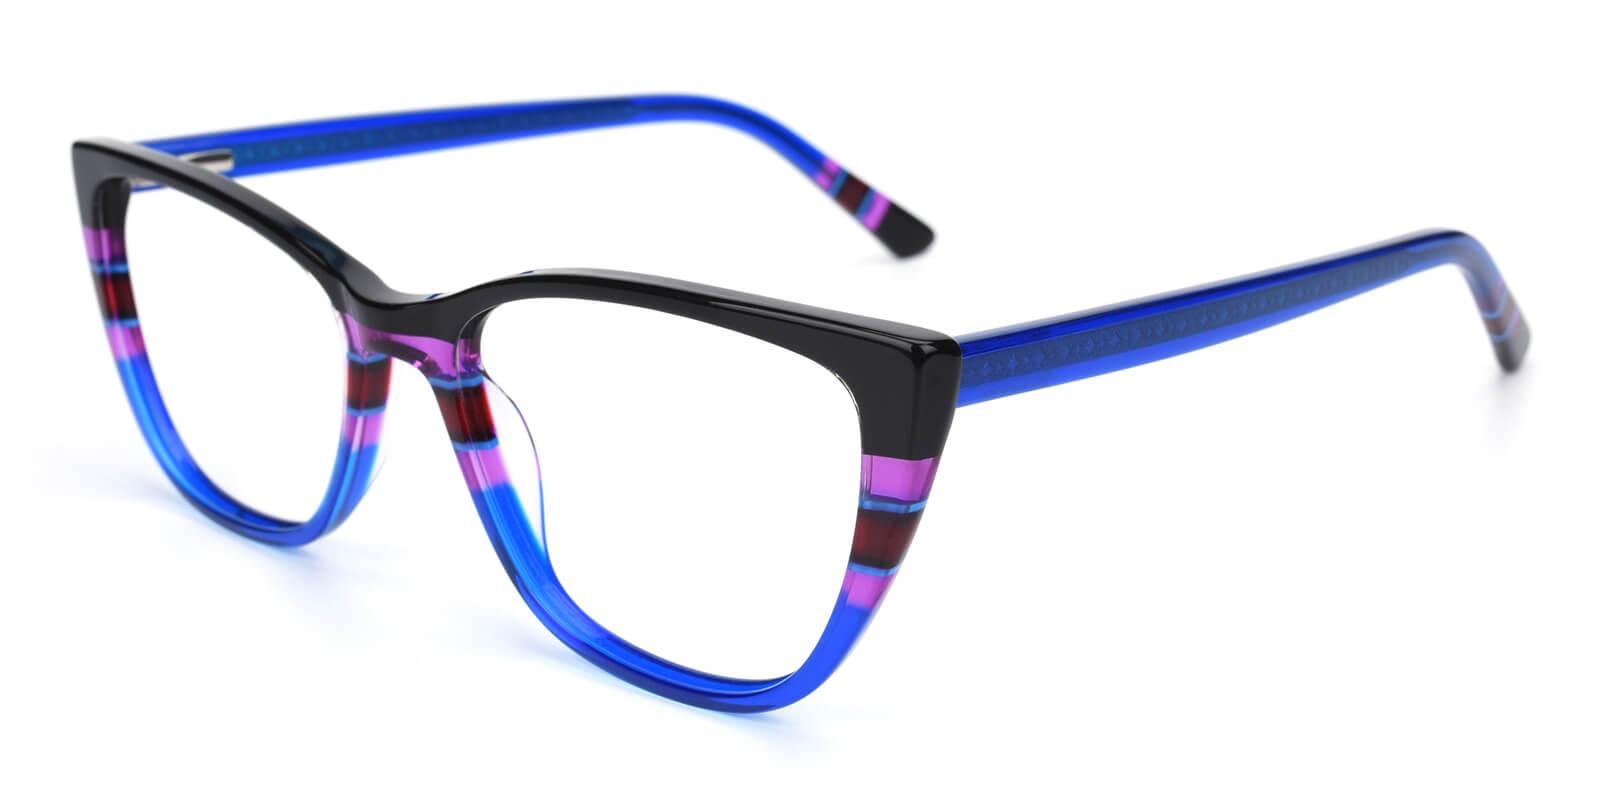 Bblythe-Blue-Cat-Acetate-Eyeglasses-additional1